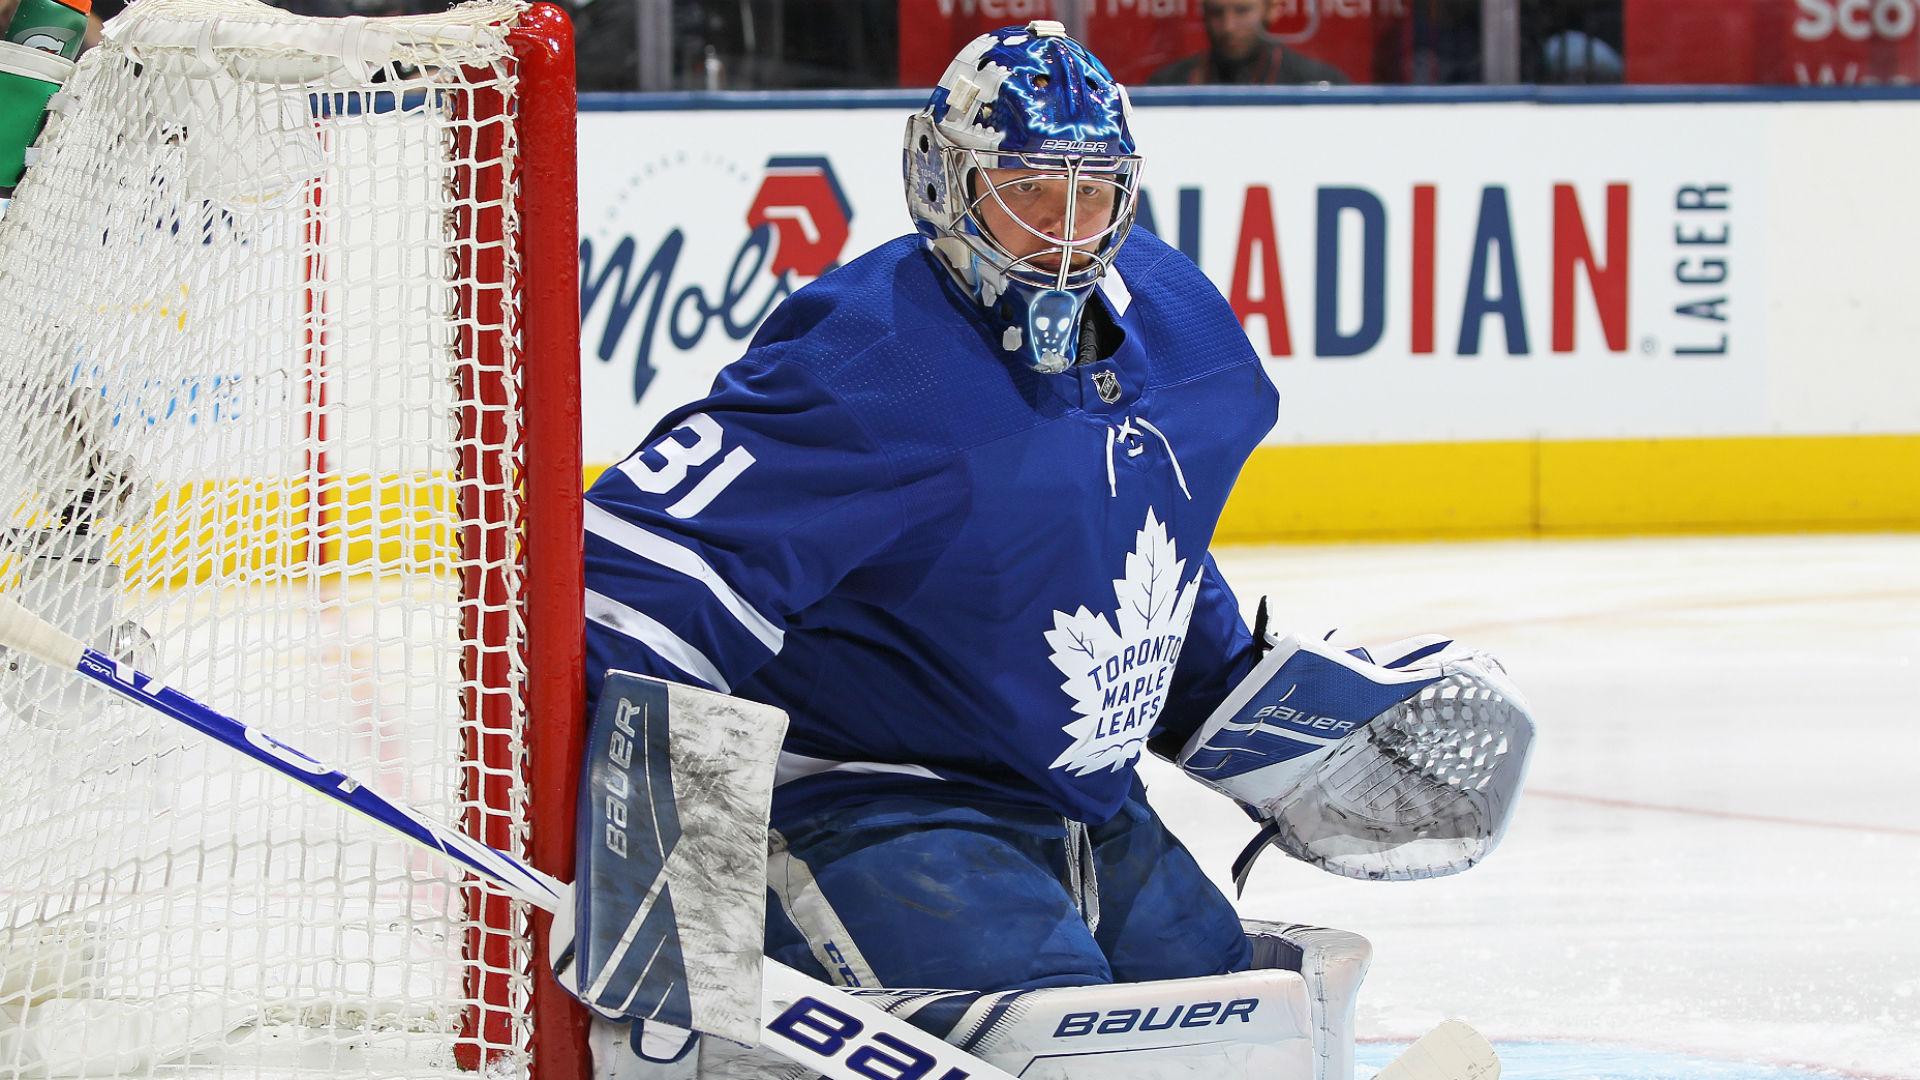 Frederik Andersen Injury Update Toronto Maple Leafs Goalie Won T Start Vs Arizona Sporting News